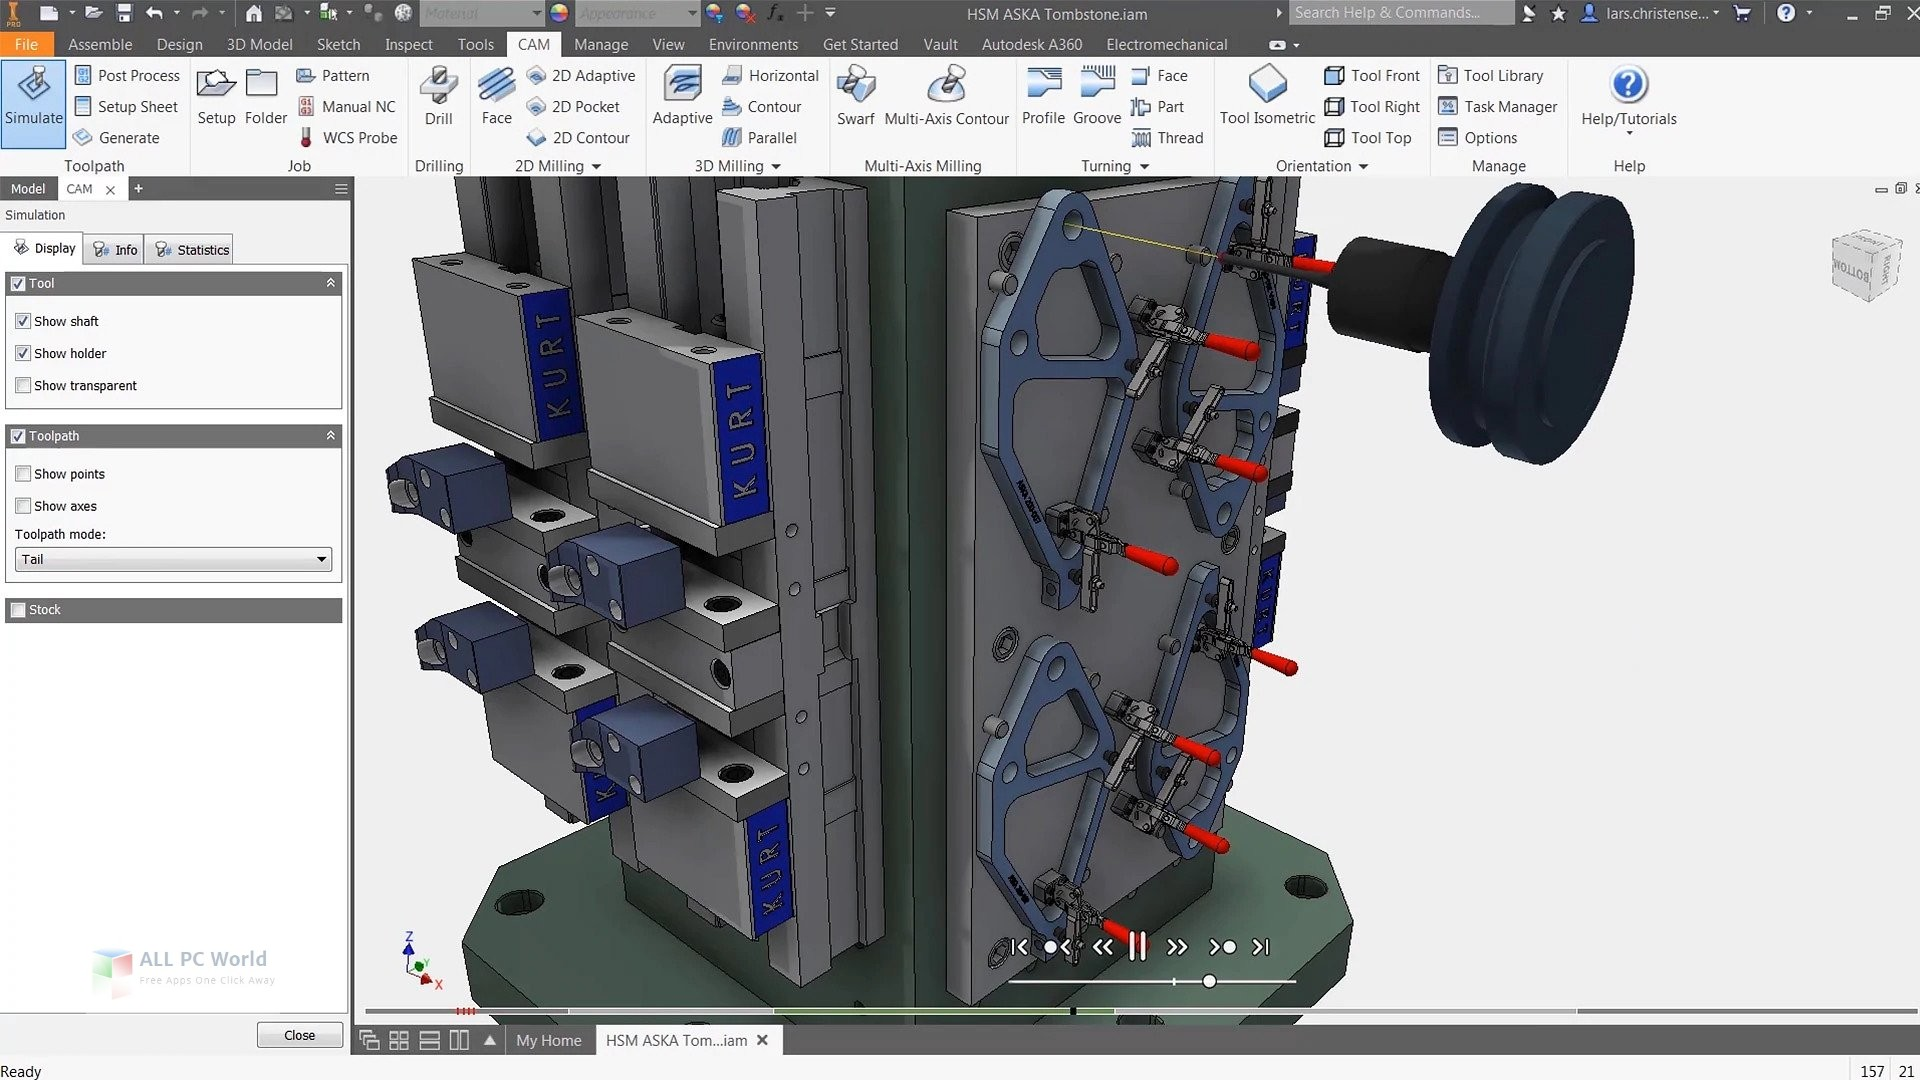 InventorCAM 2020 for Autodesk Inventor x64 Download